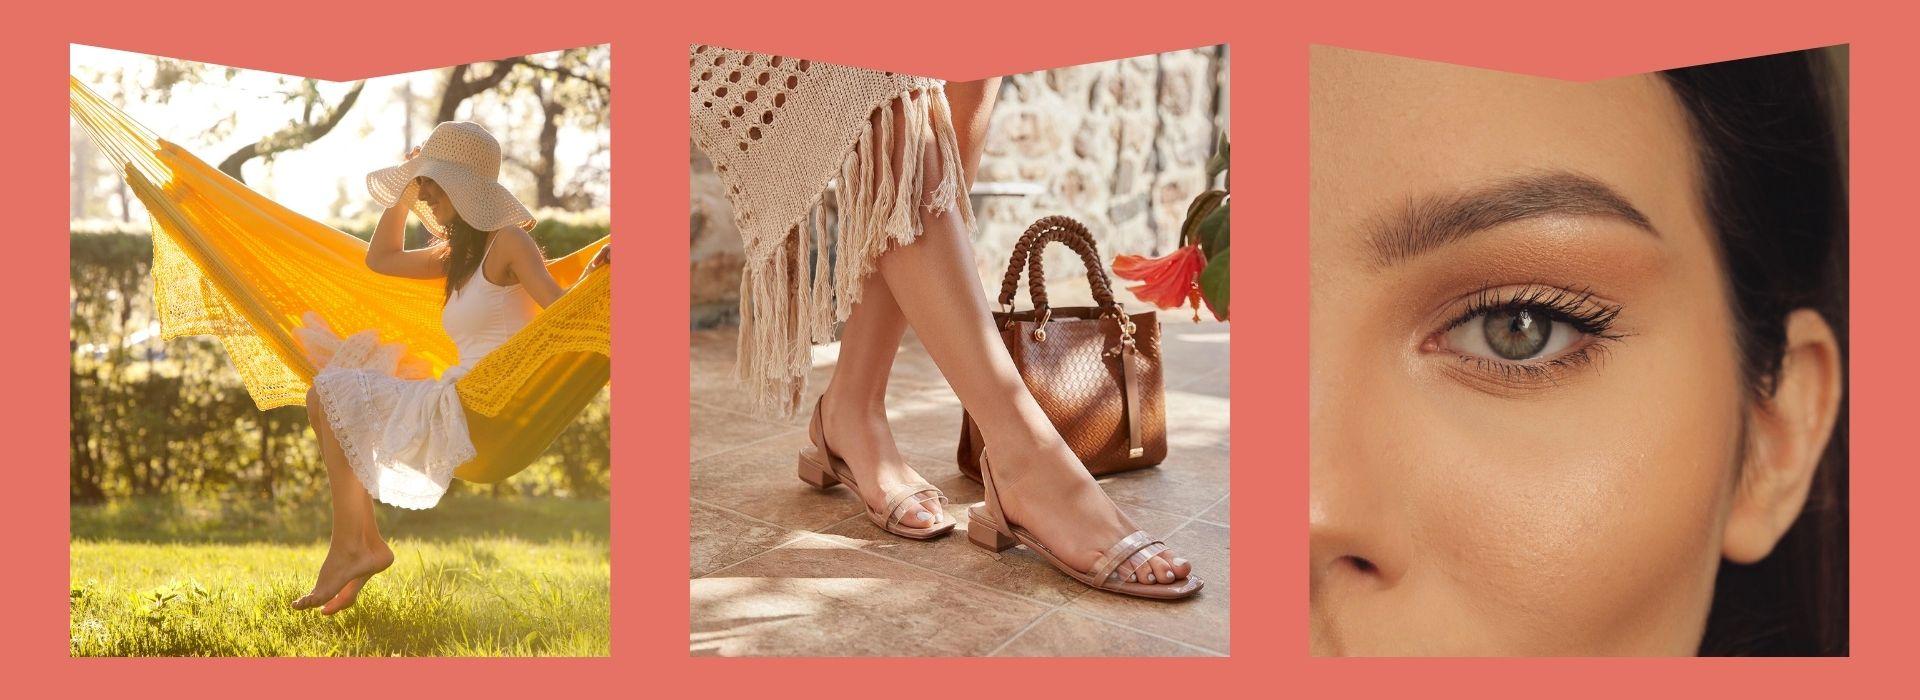 Flowy dress, sandals, woman's eyelashes